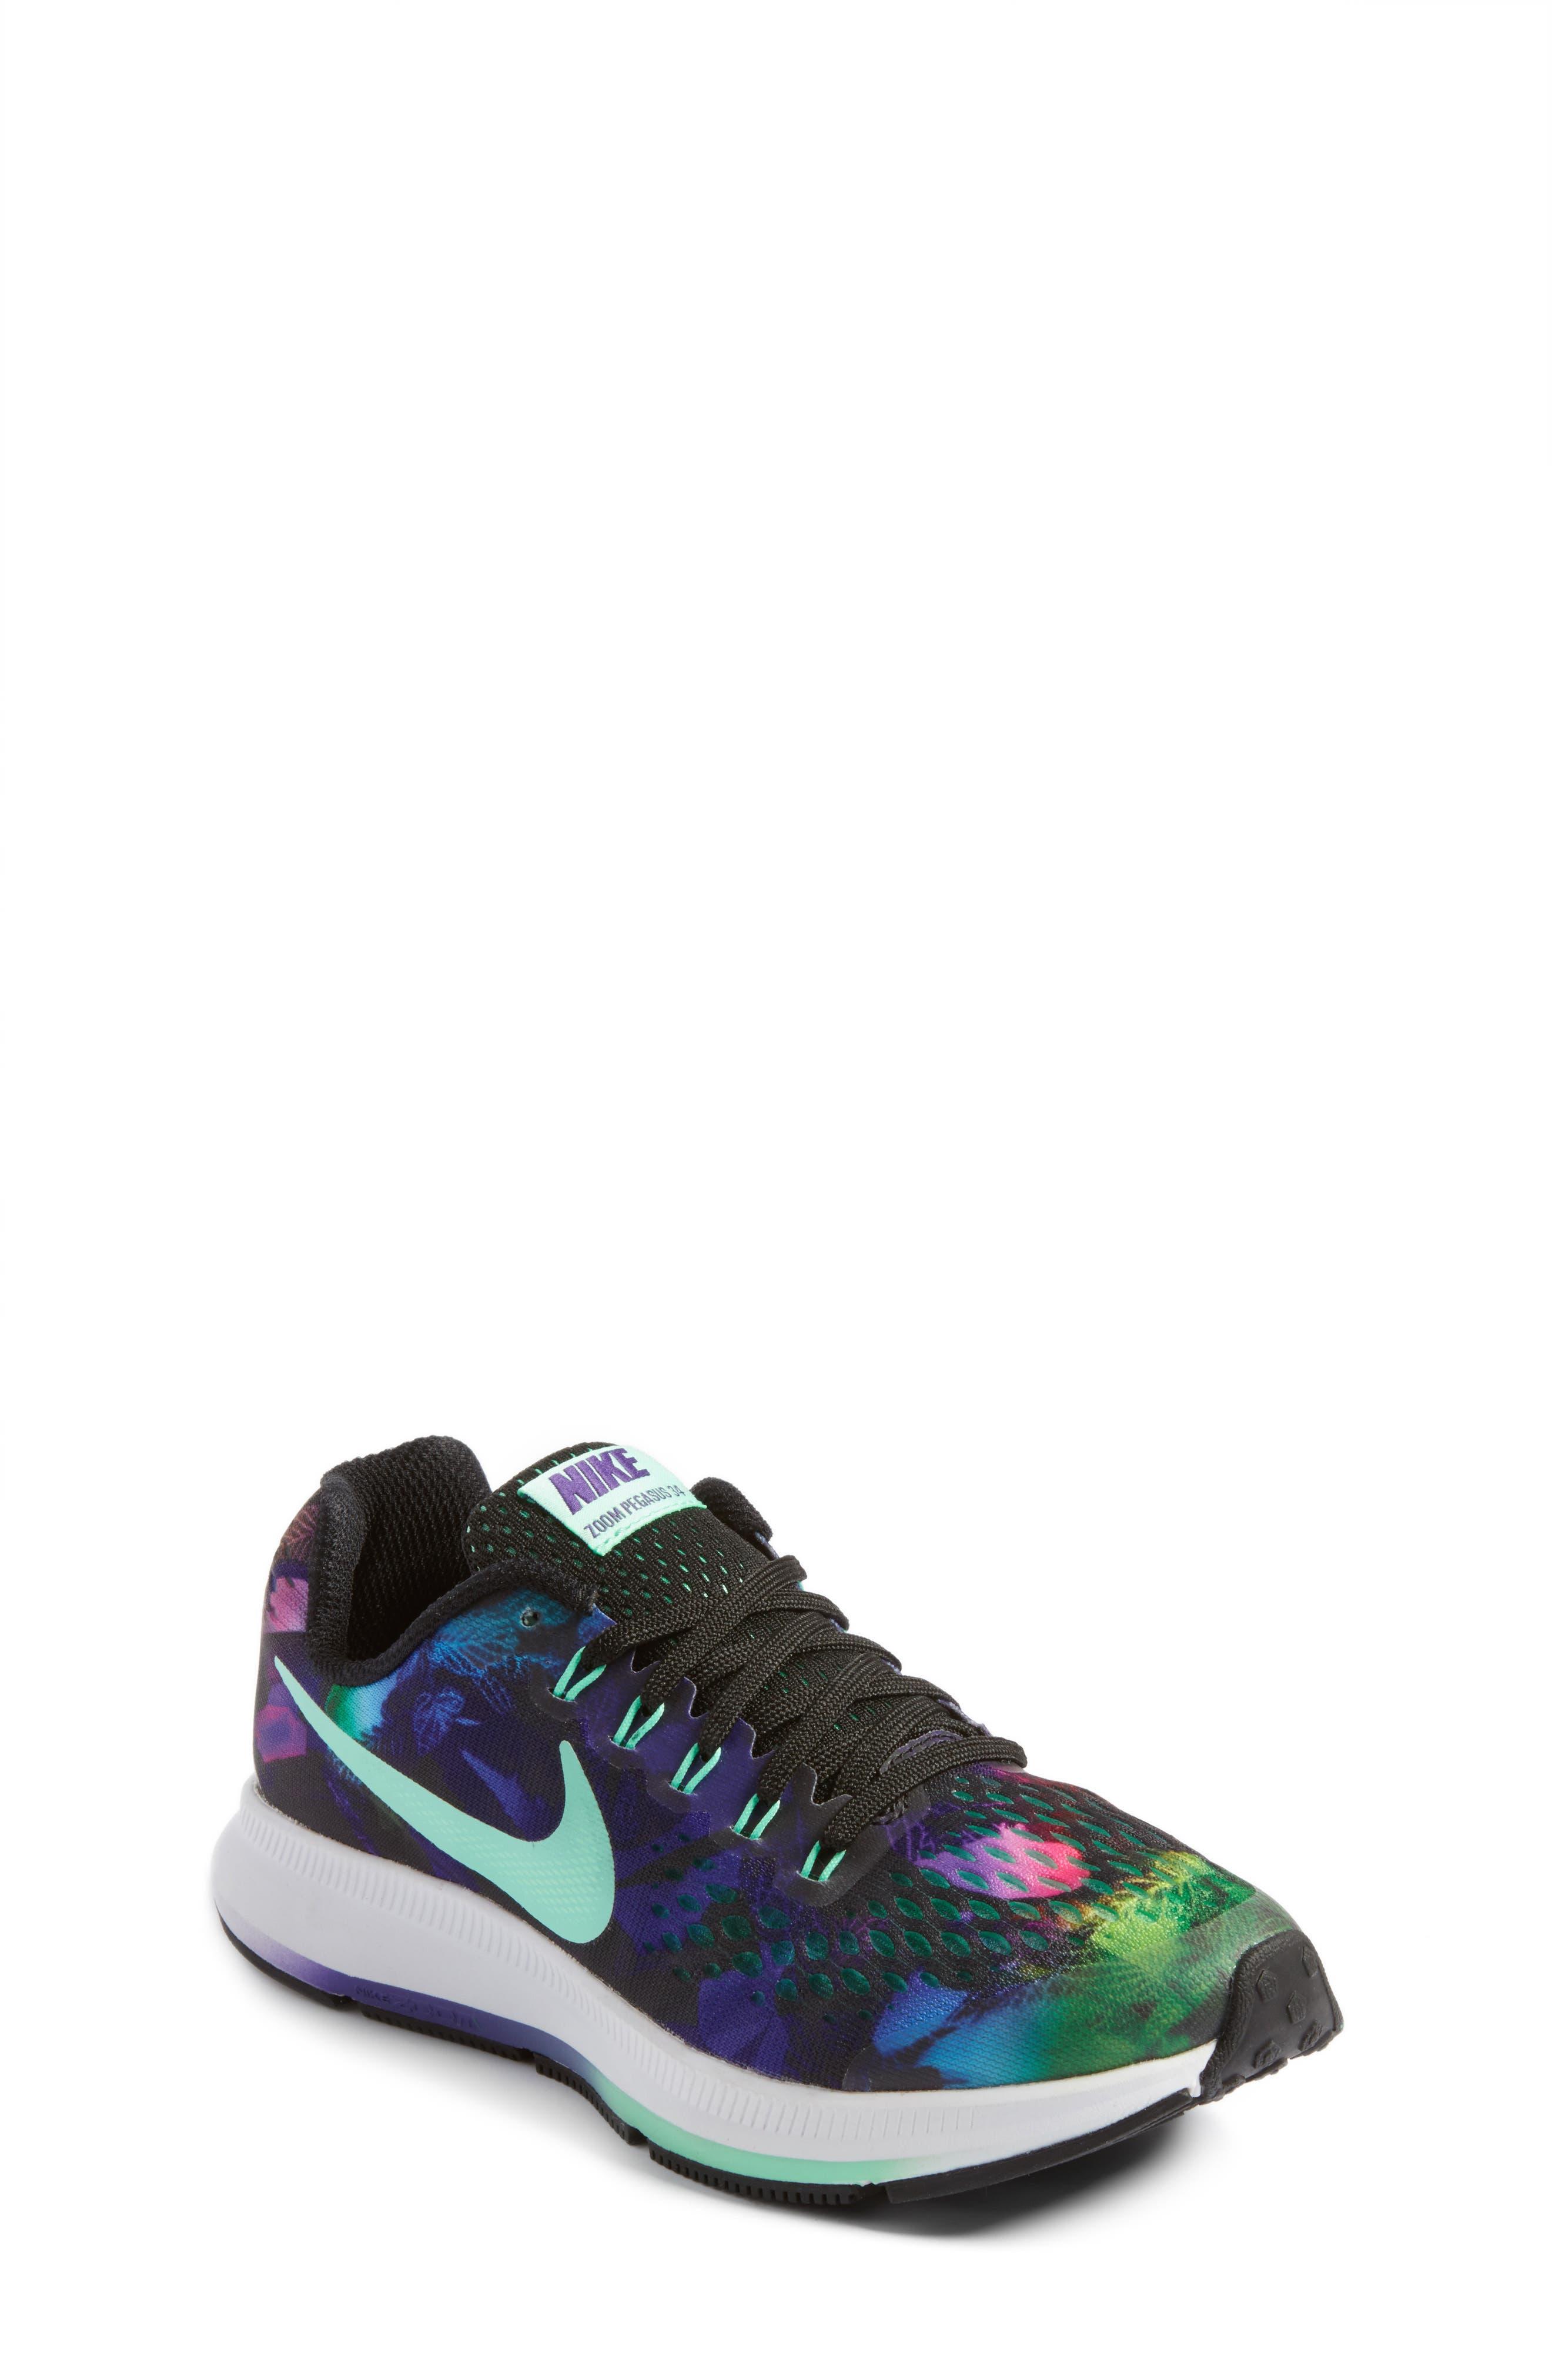 Main Image - Nike Zoom Pegasus 34 Print Sneaker (Little Kid & Big Kid)